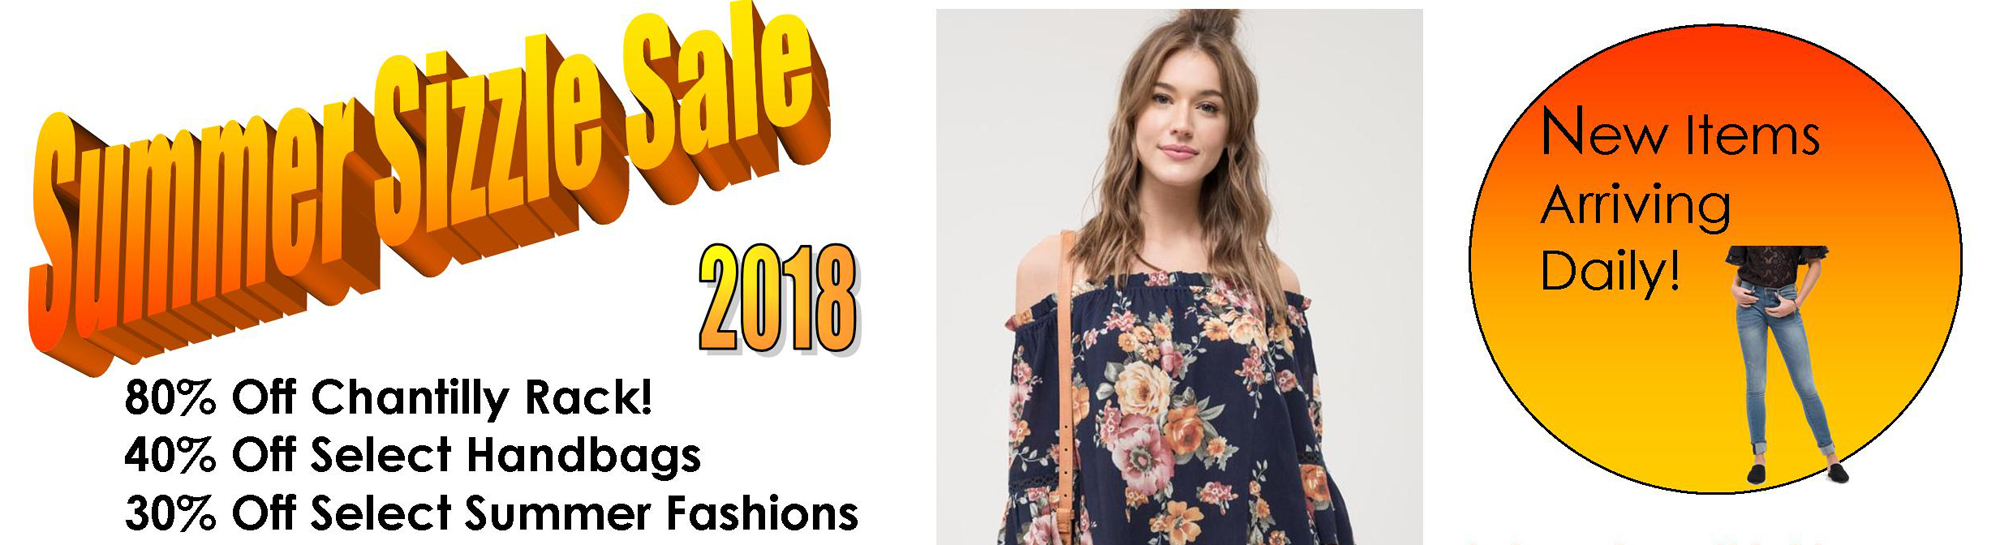 summer-sale-rotation